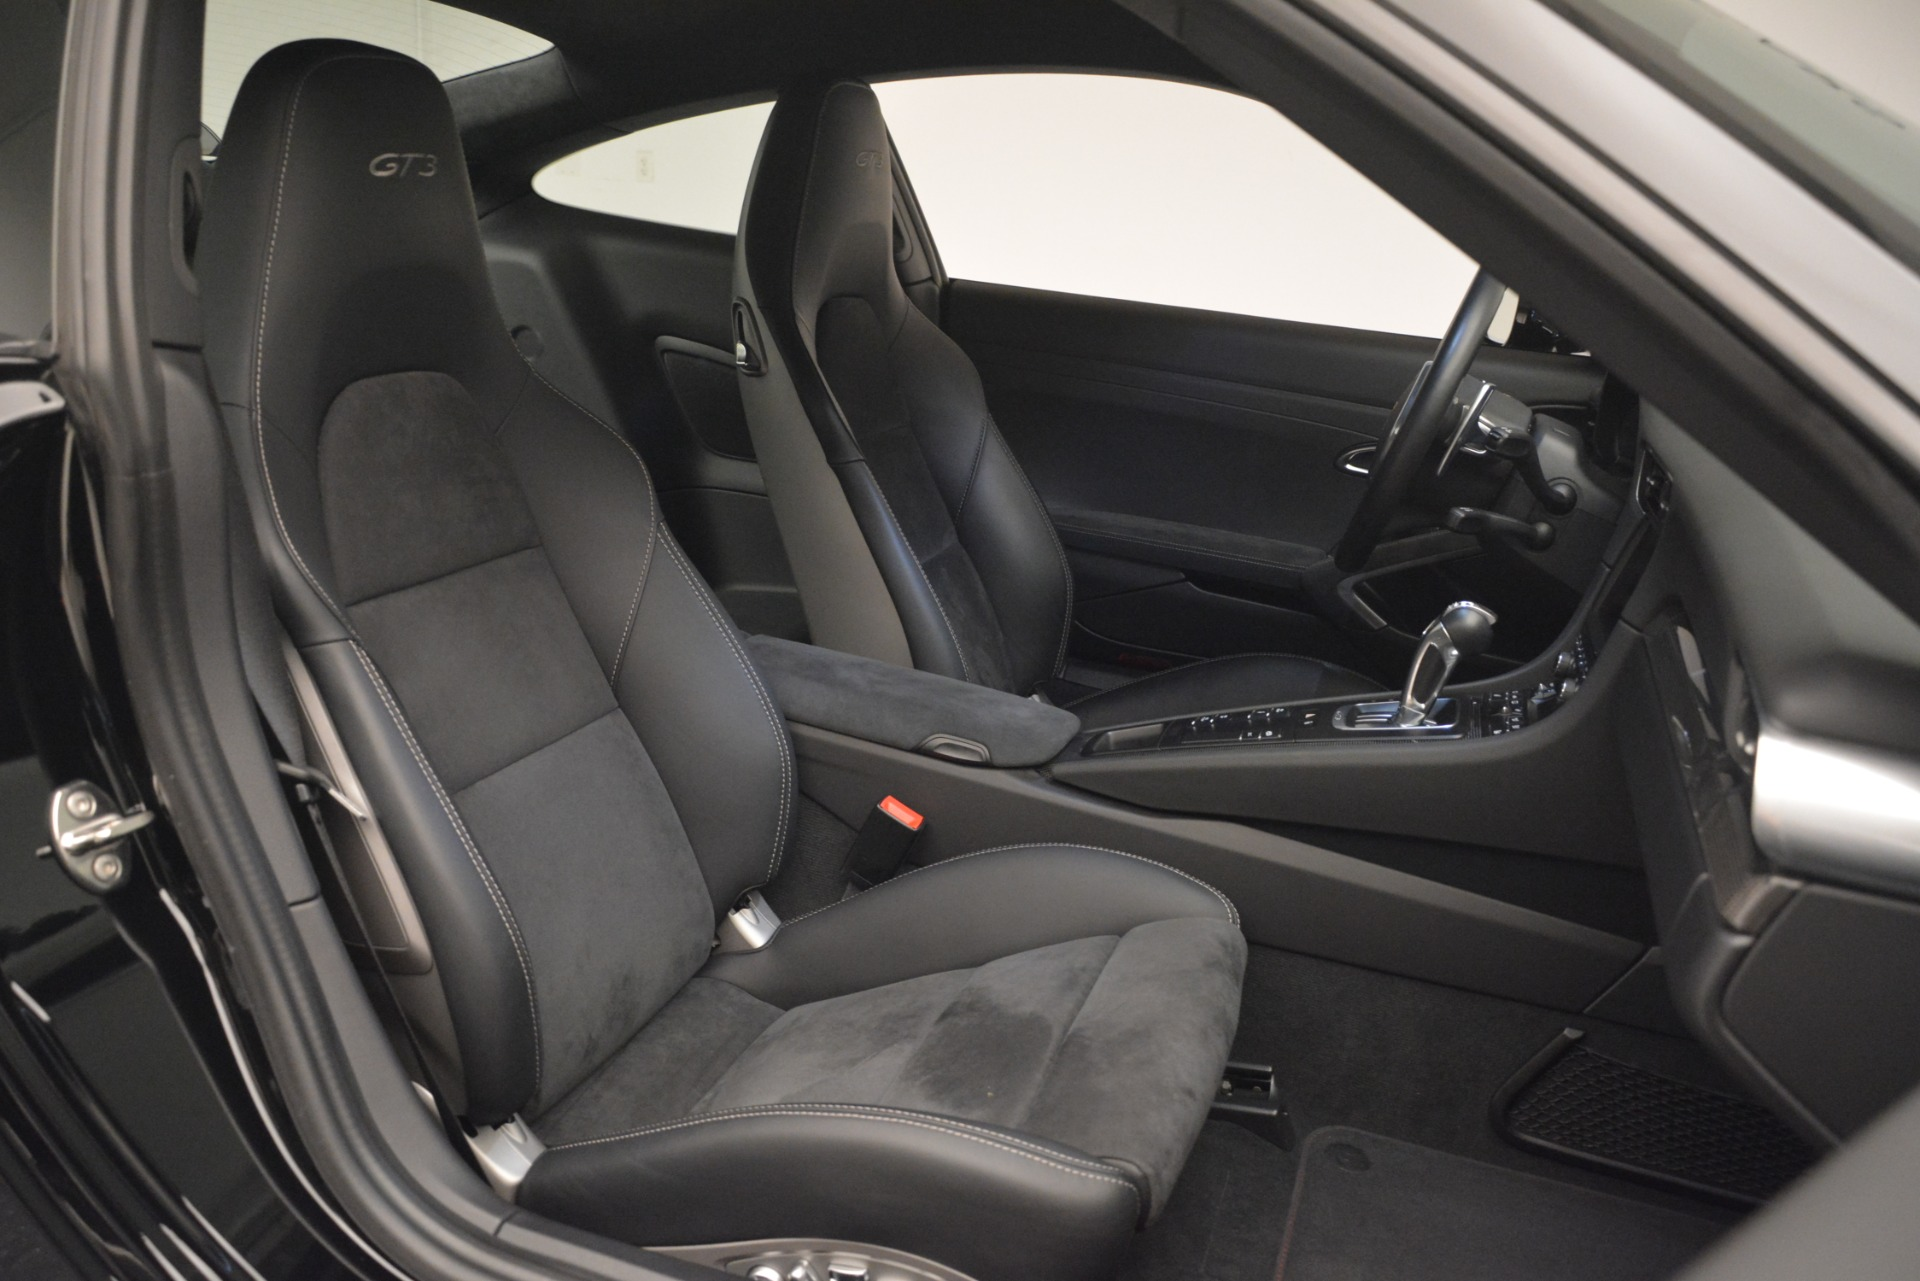 Used 2015 Porsche 911 GT3 For Sale In Greenwich, CT. Alfa Romeo of Greenwich, 7516 3009_p21